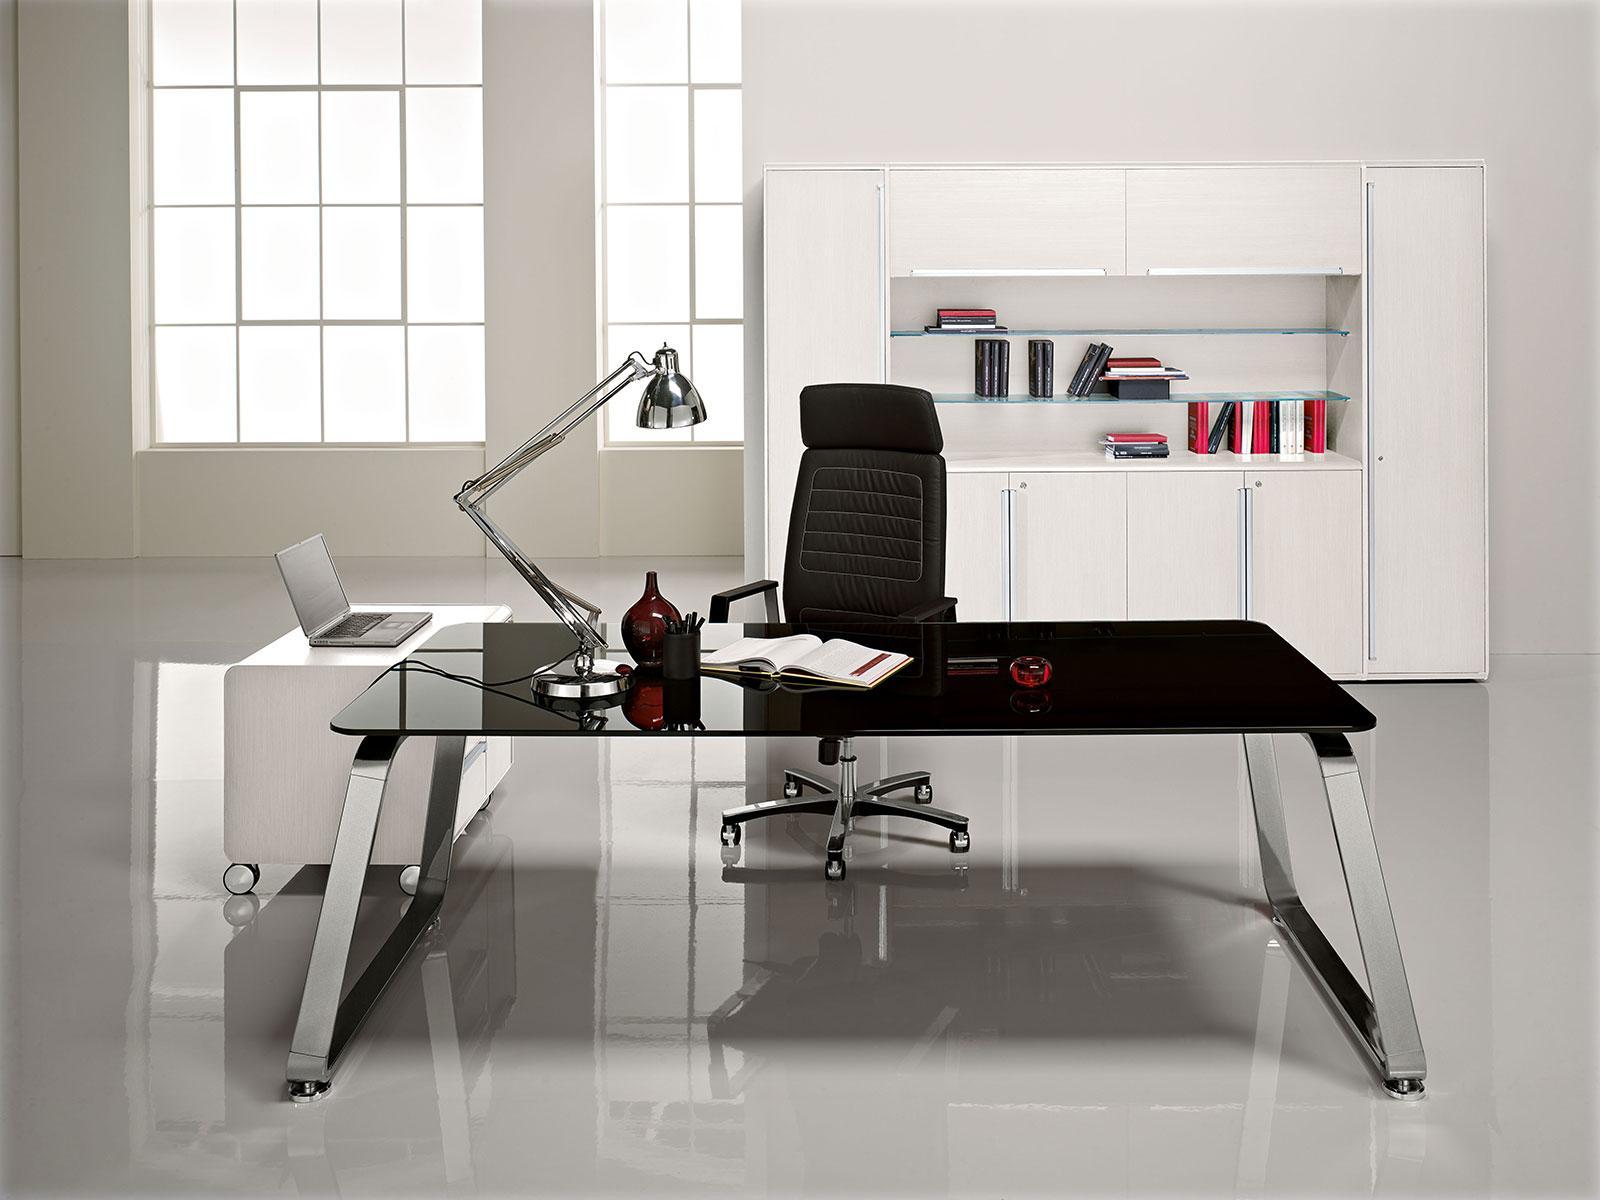 Bureau en verre vente en ligne italy dream design - Bureau de direction luxe ...